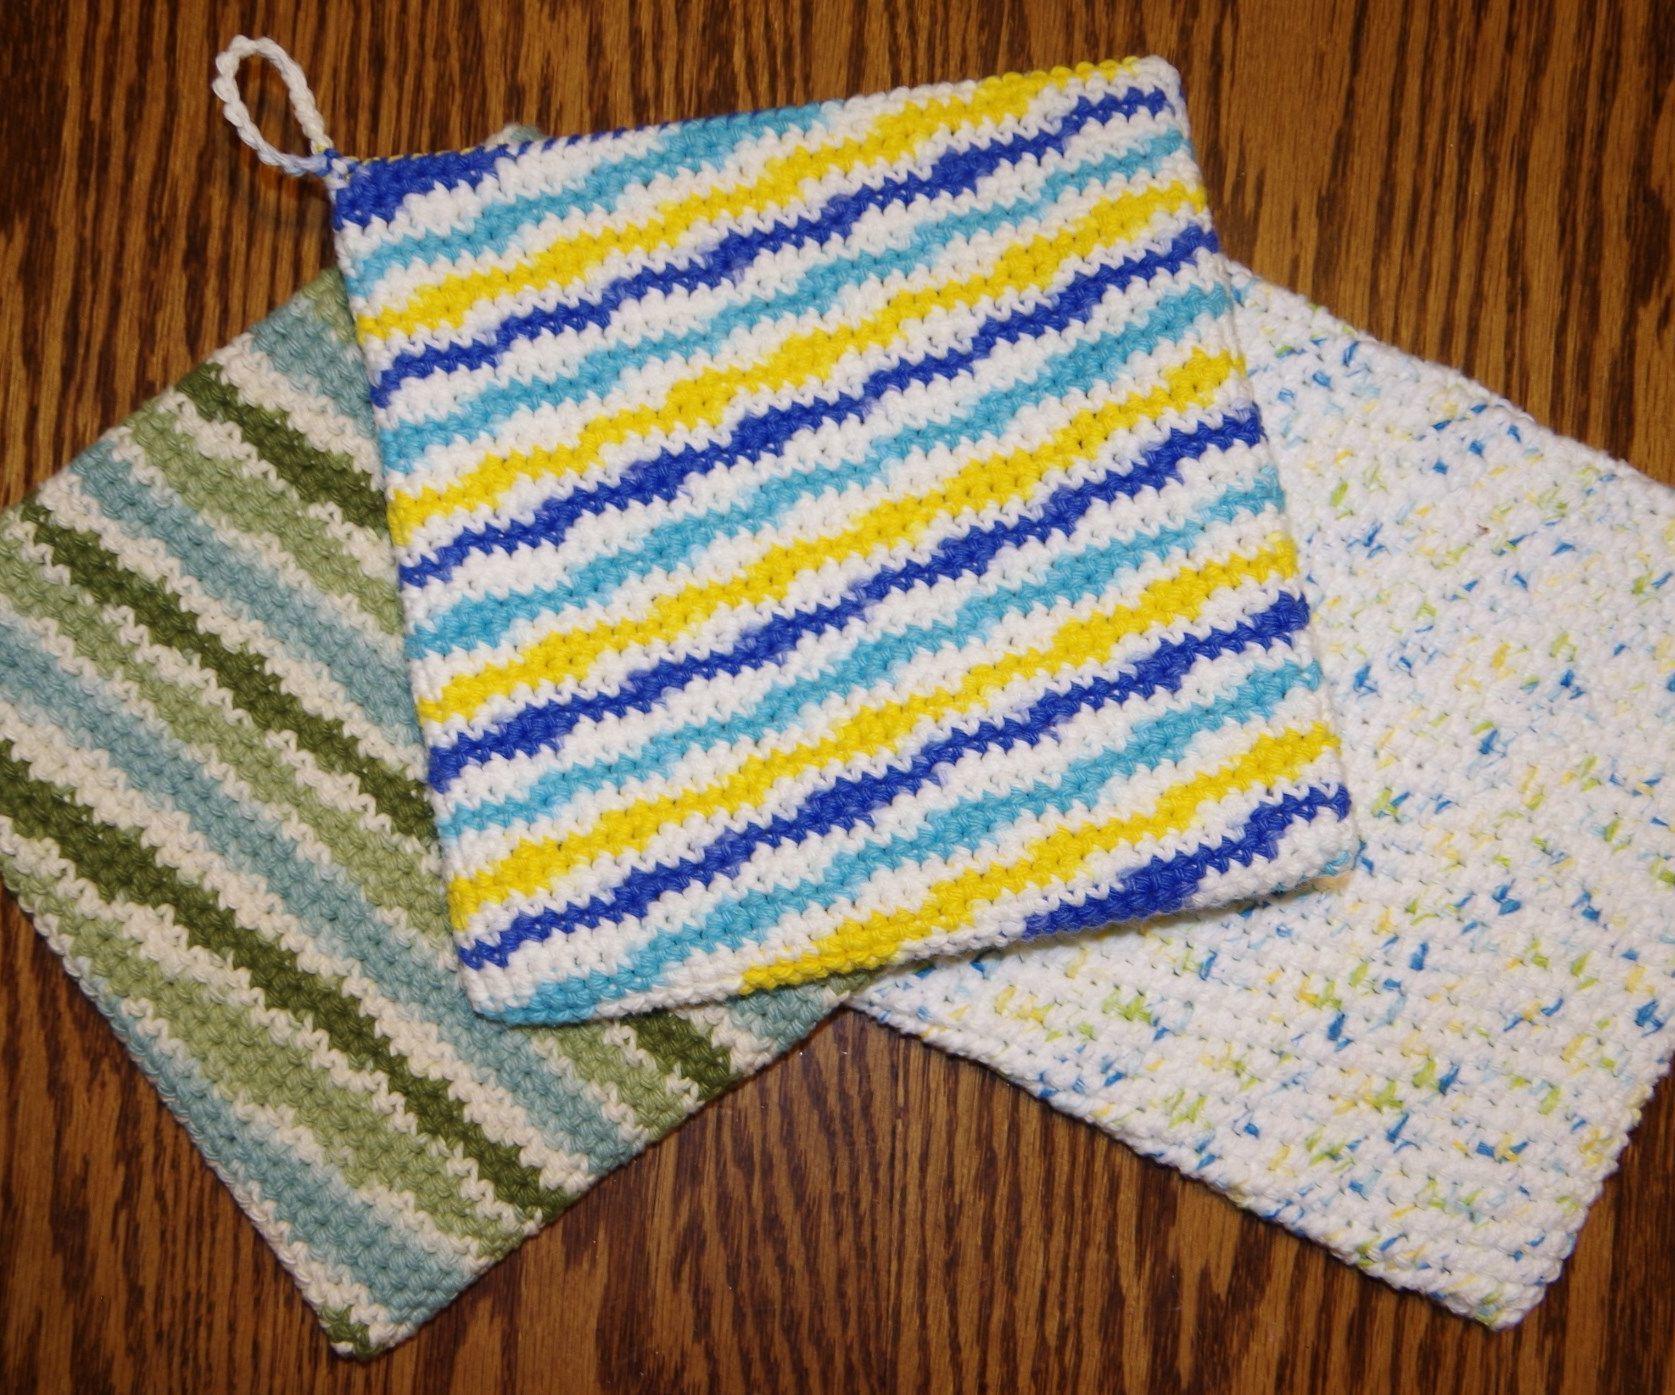 Double Thick Single Crochet Potholder | Crochet potholders ...